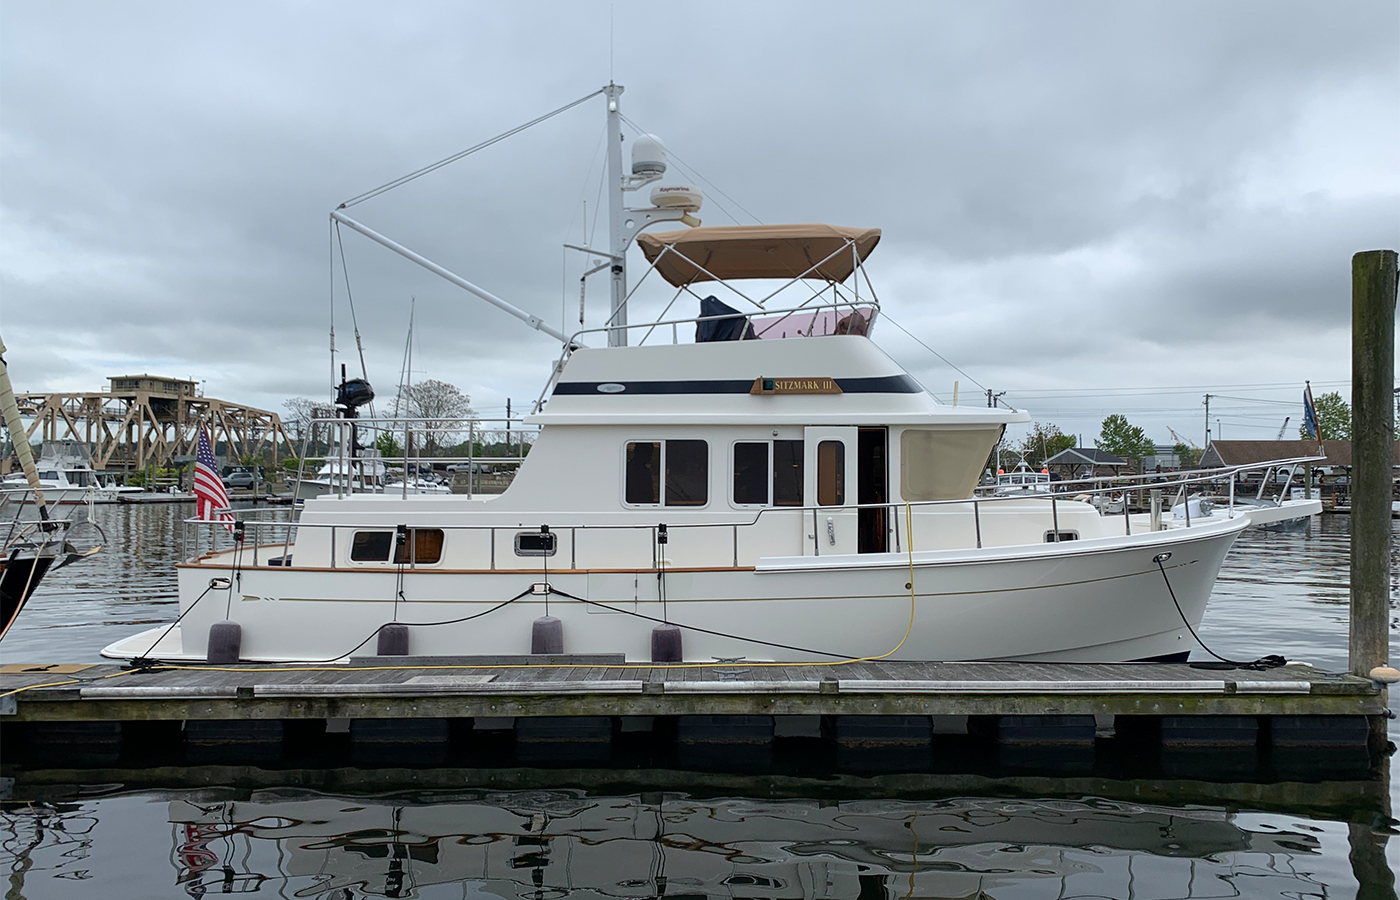 Selene Trawler SITZMARK III Sold By Yacht Broker Chris Davis